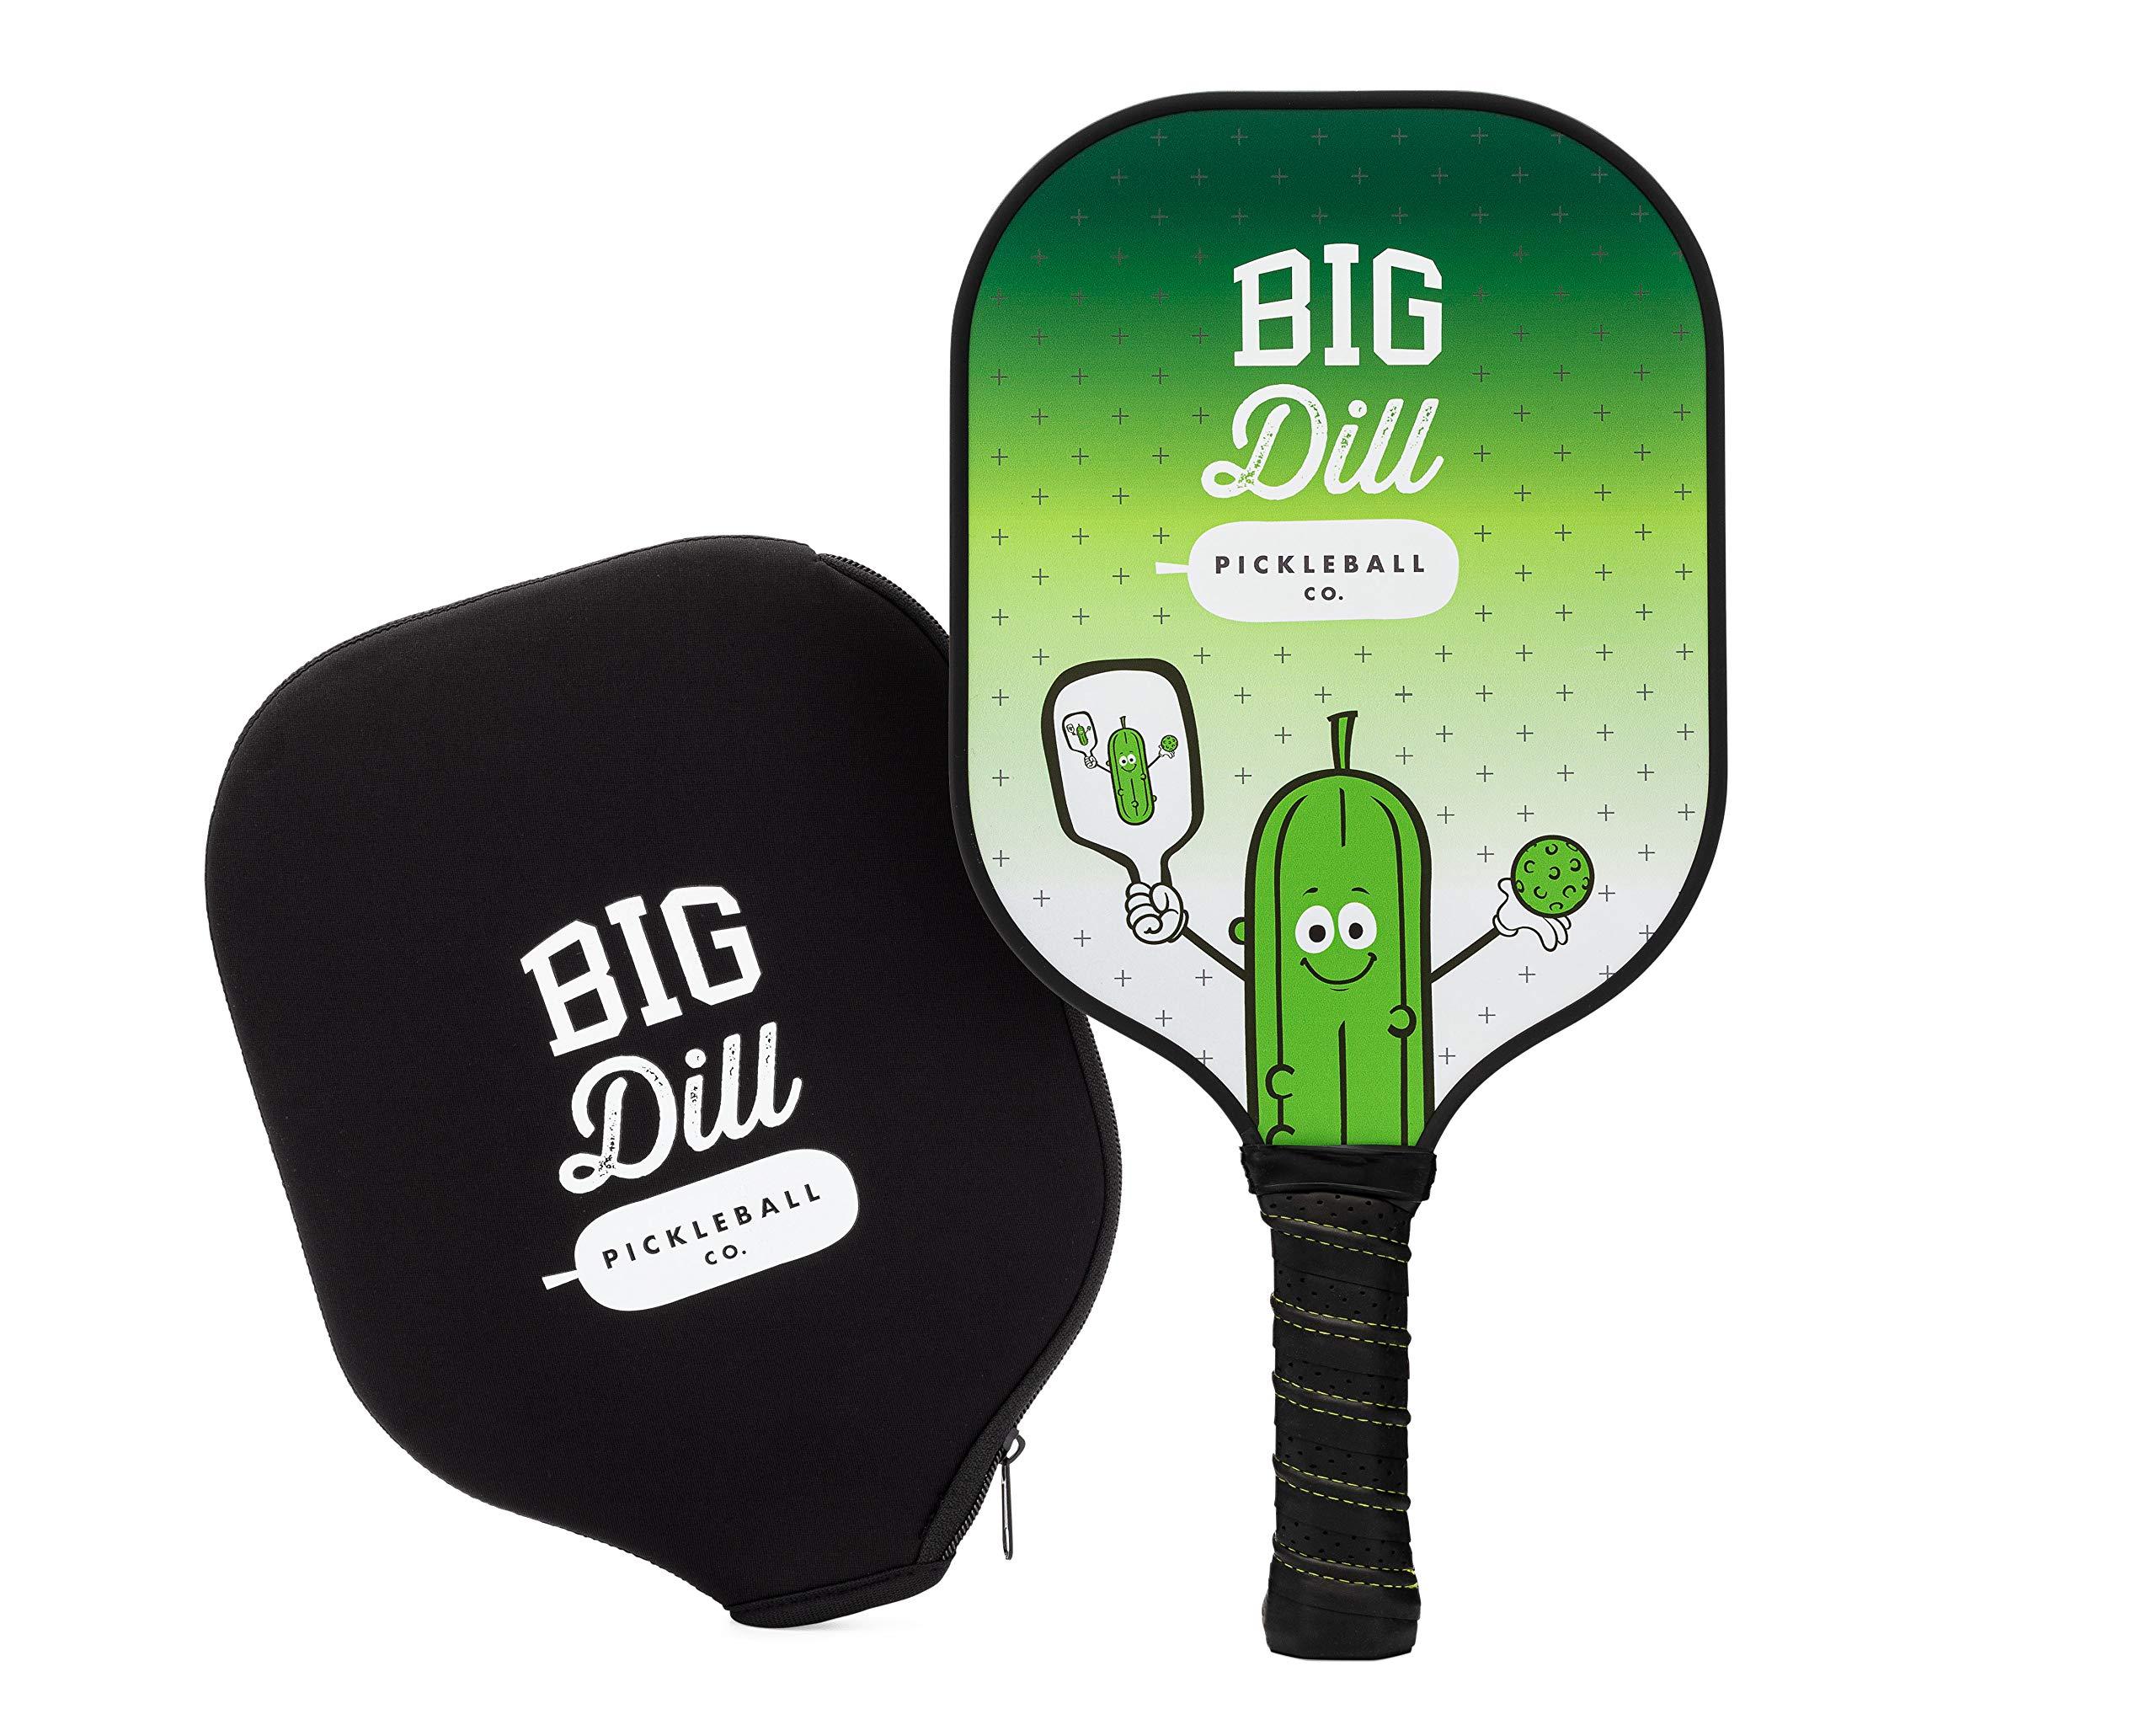 Big Dill Pickleball Co. Original Carbon Fiber Pickleball Pad